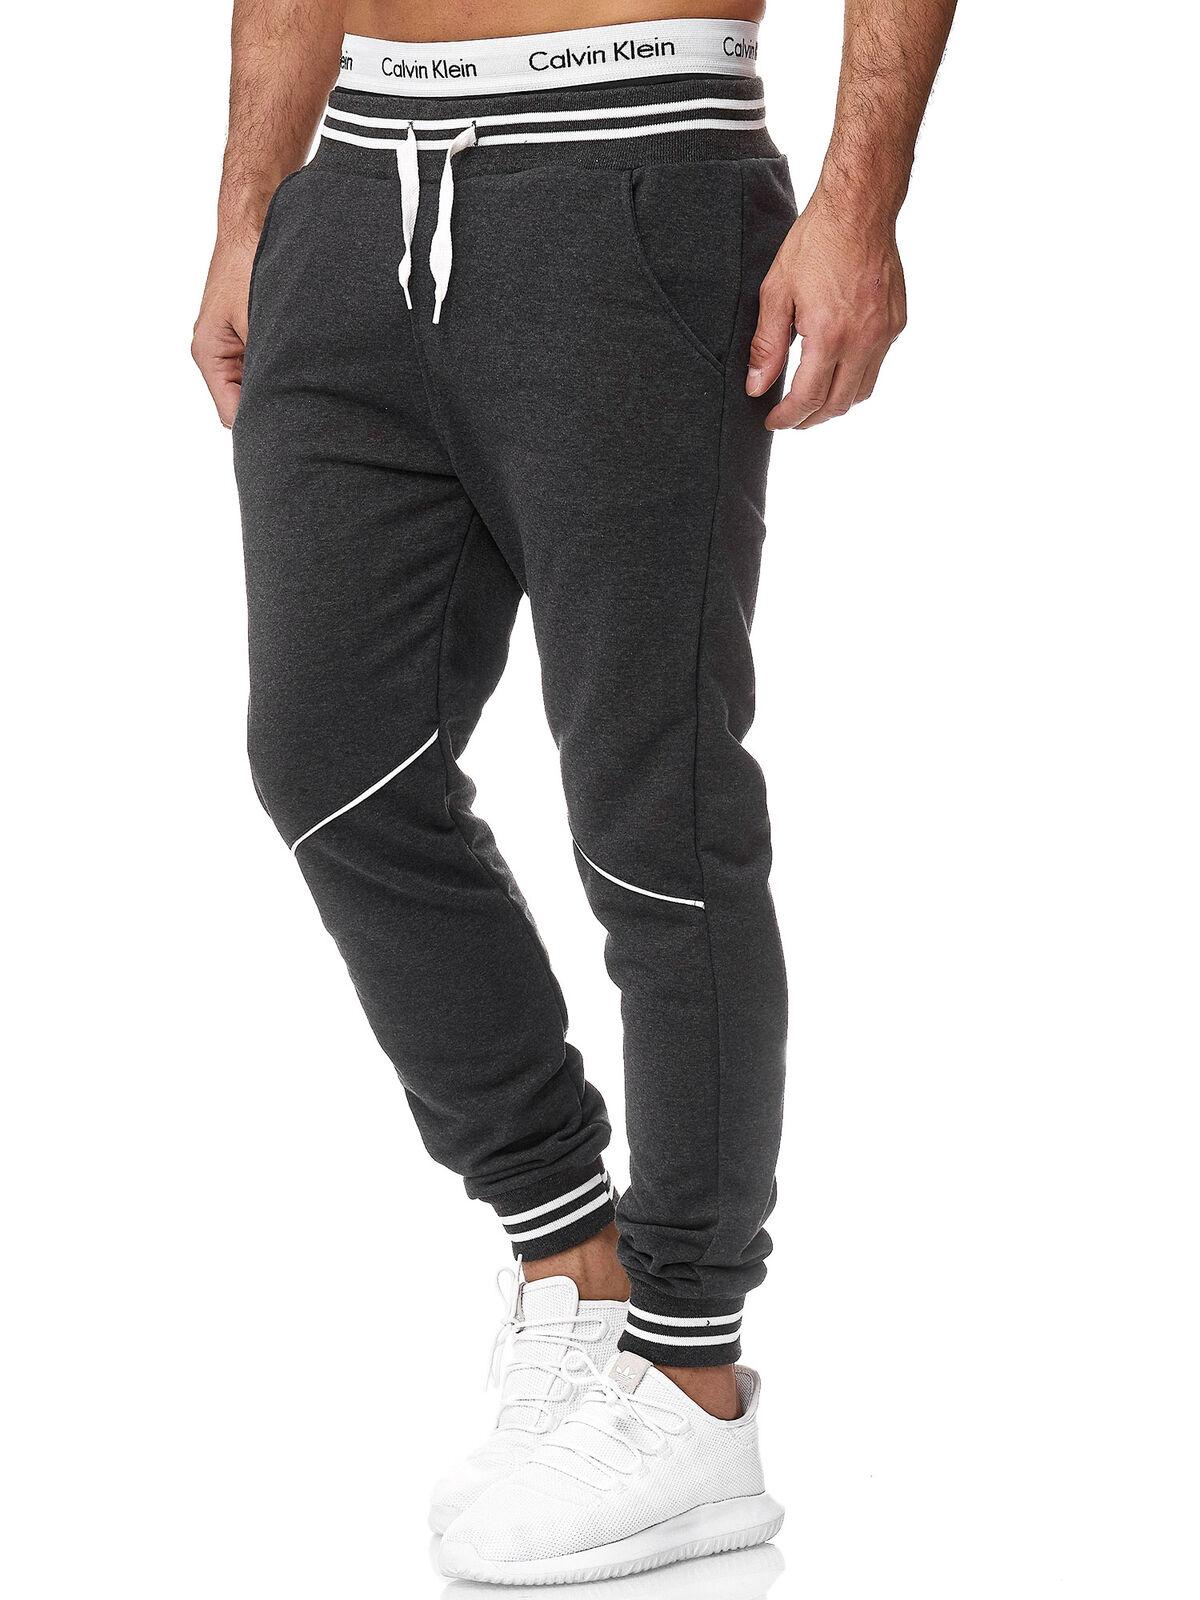 Code47 Men/'s Jogging Pants Tracksuit Bottoms Sports Fitness Gym Training S